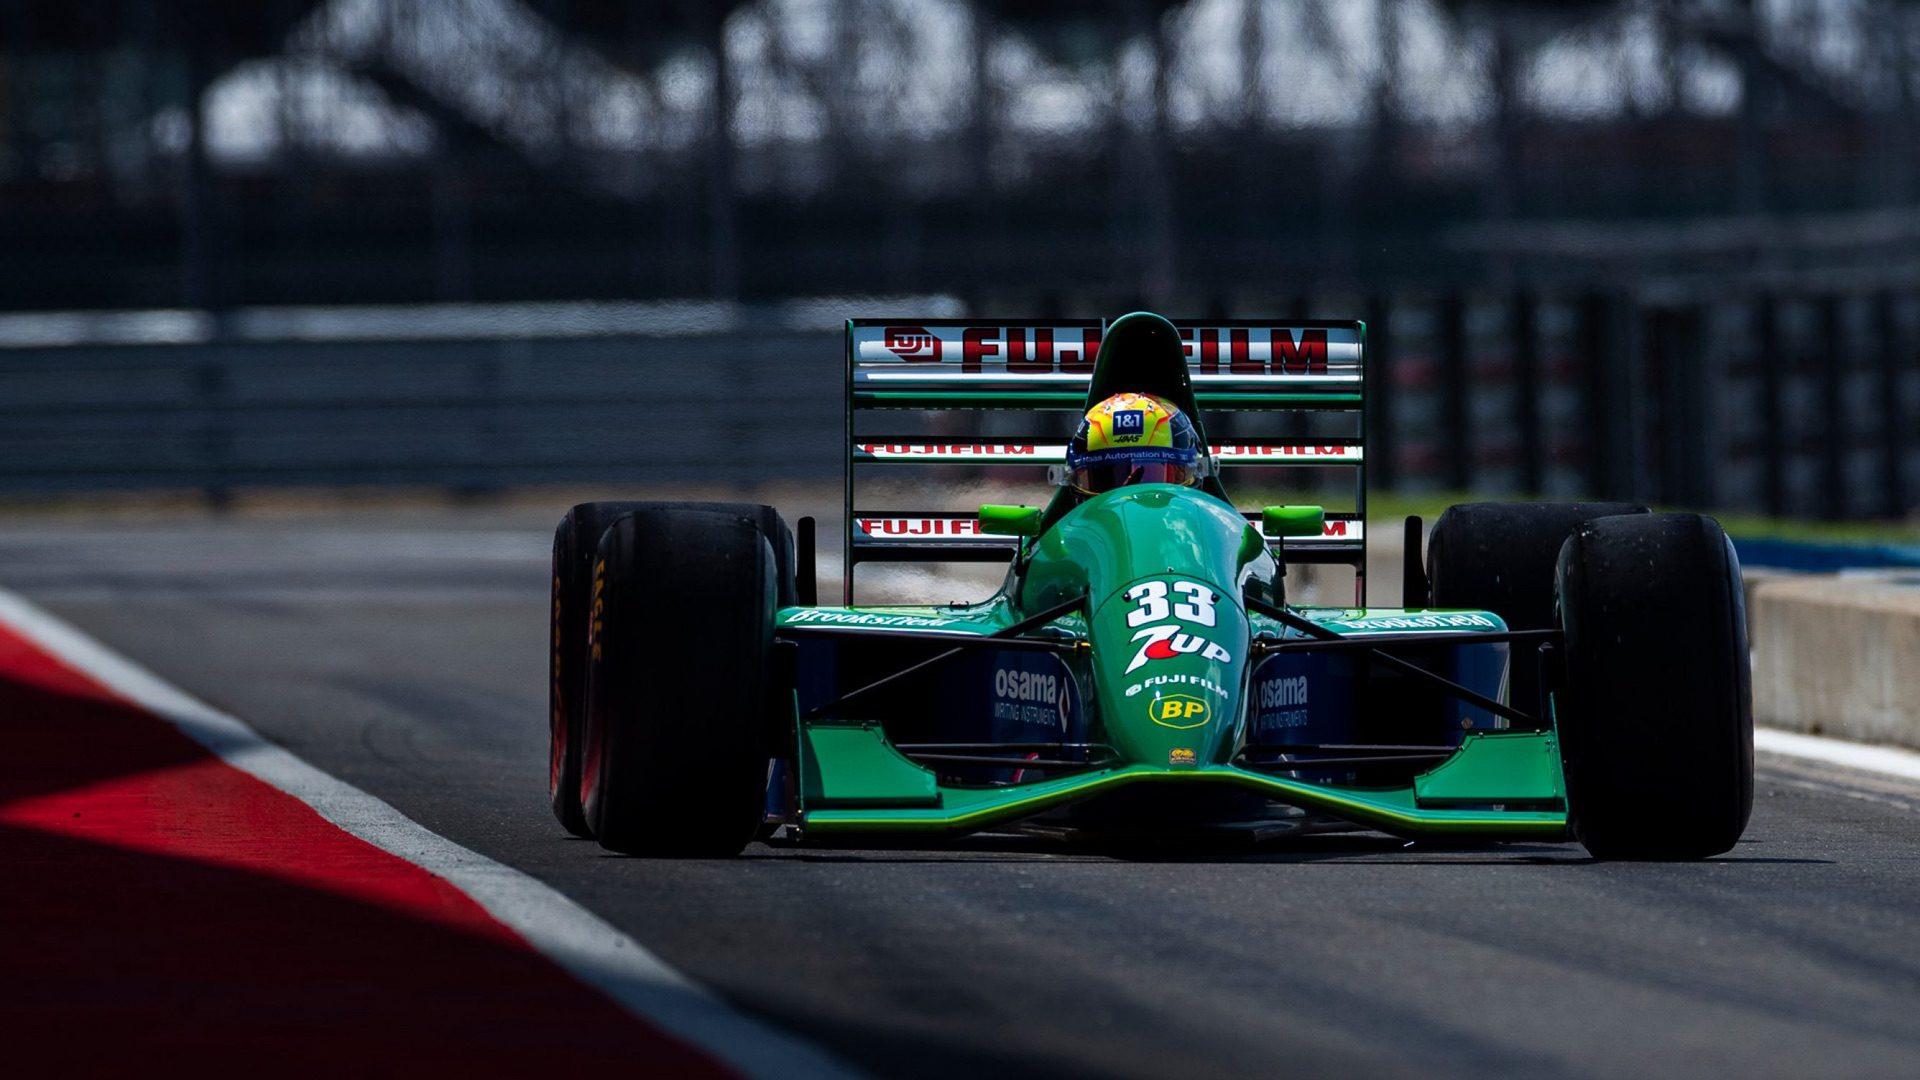 Mick_Schumacher_Jordan_191_Silverstone-0002